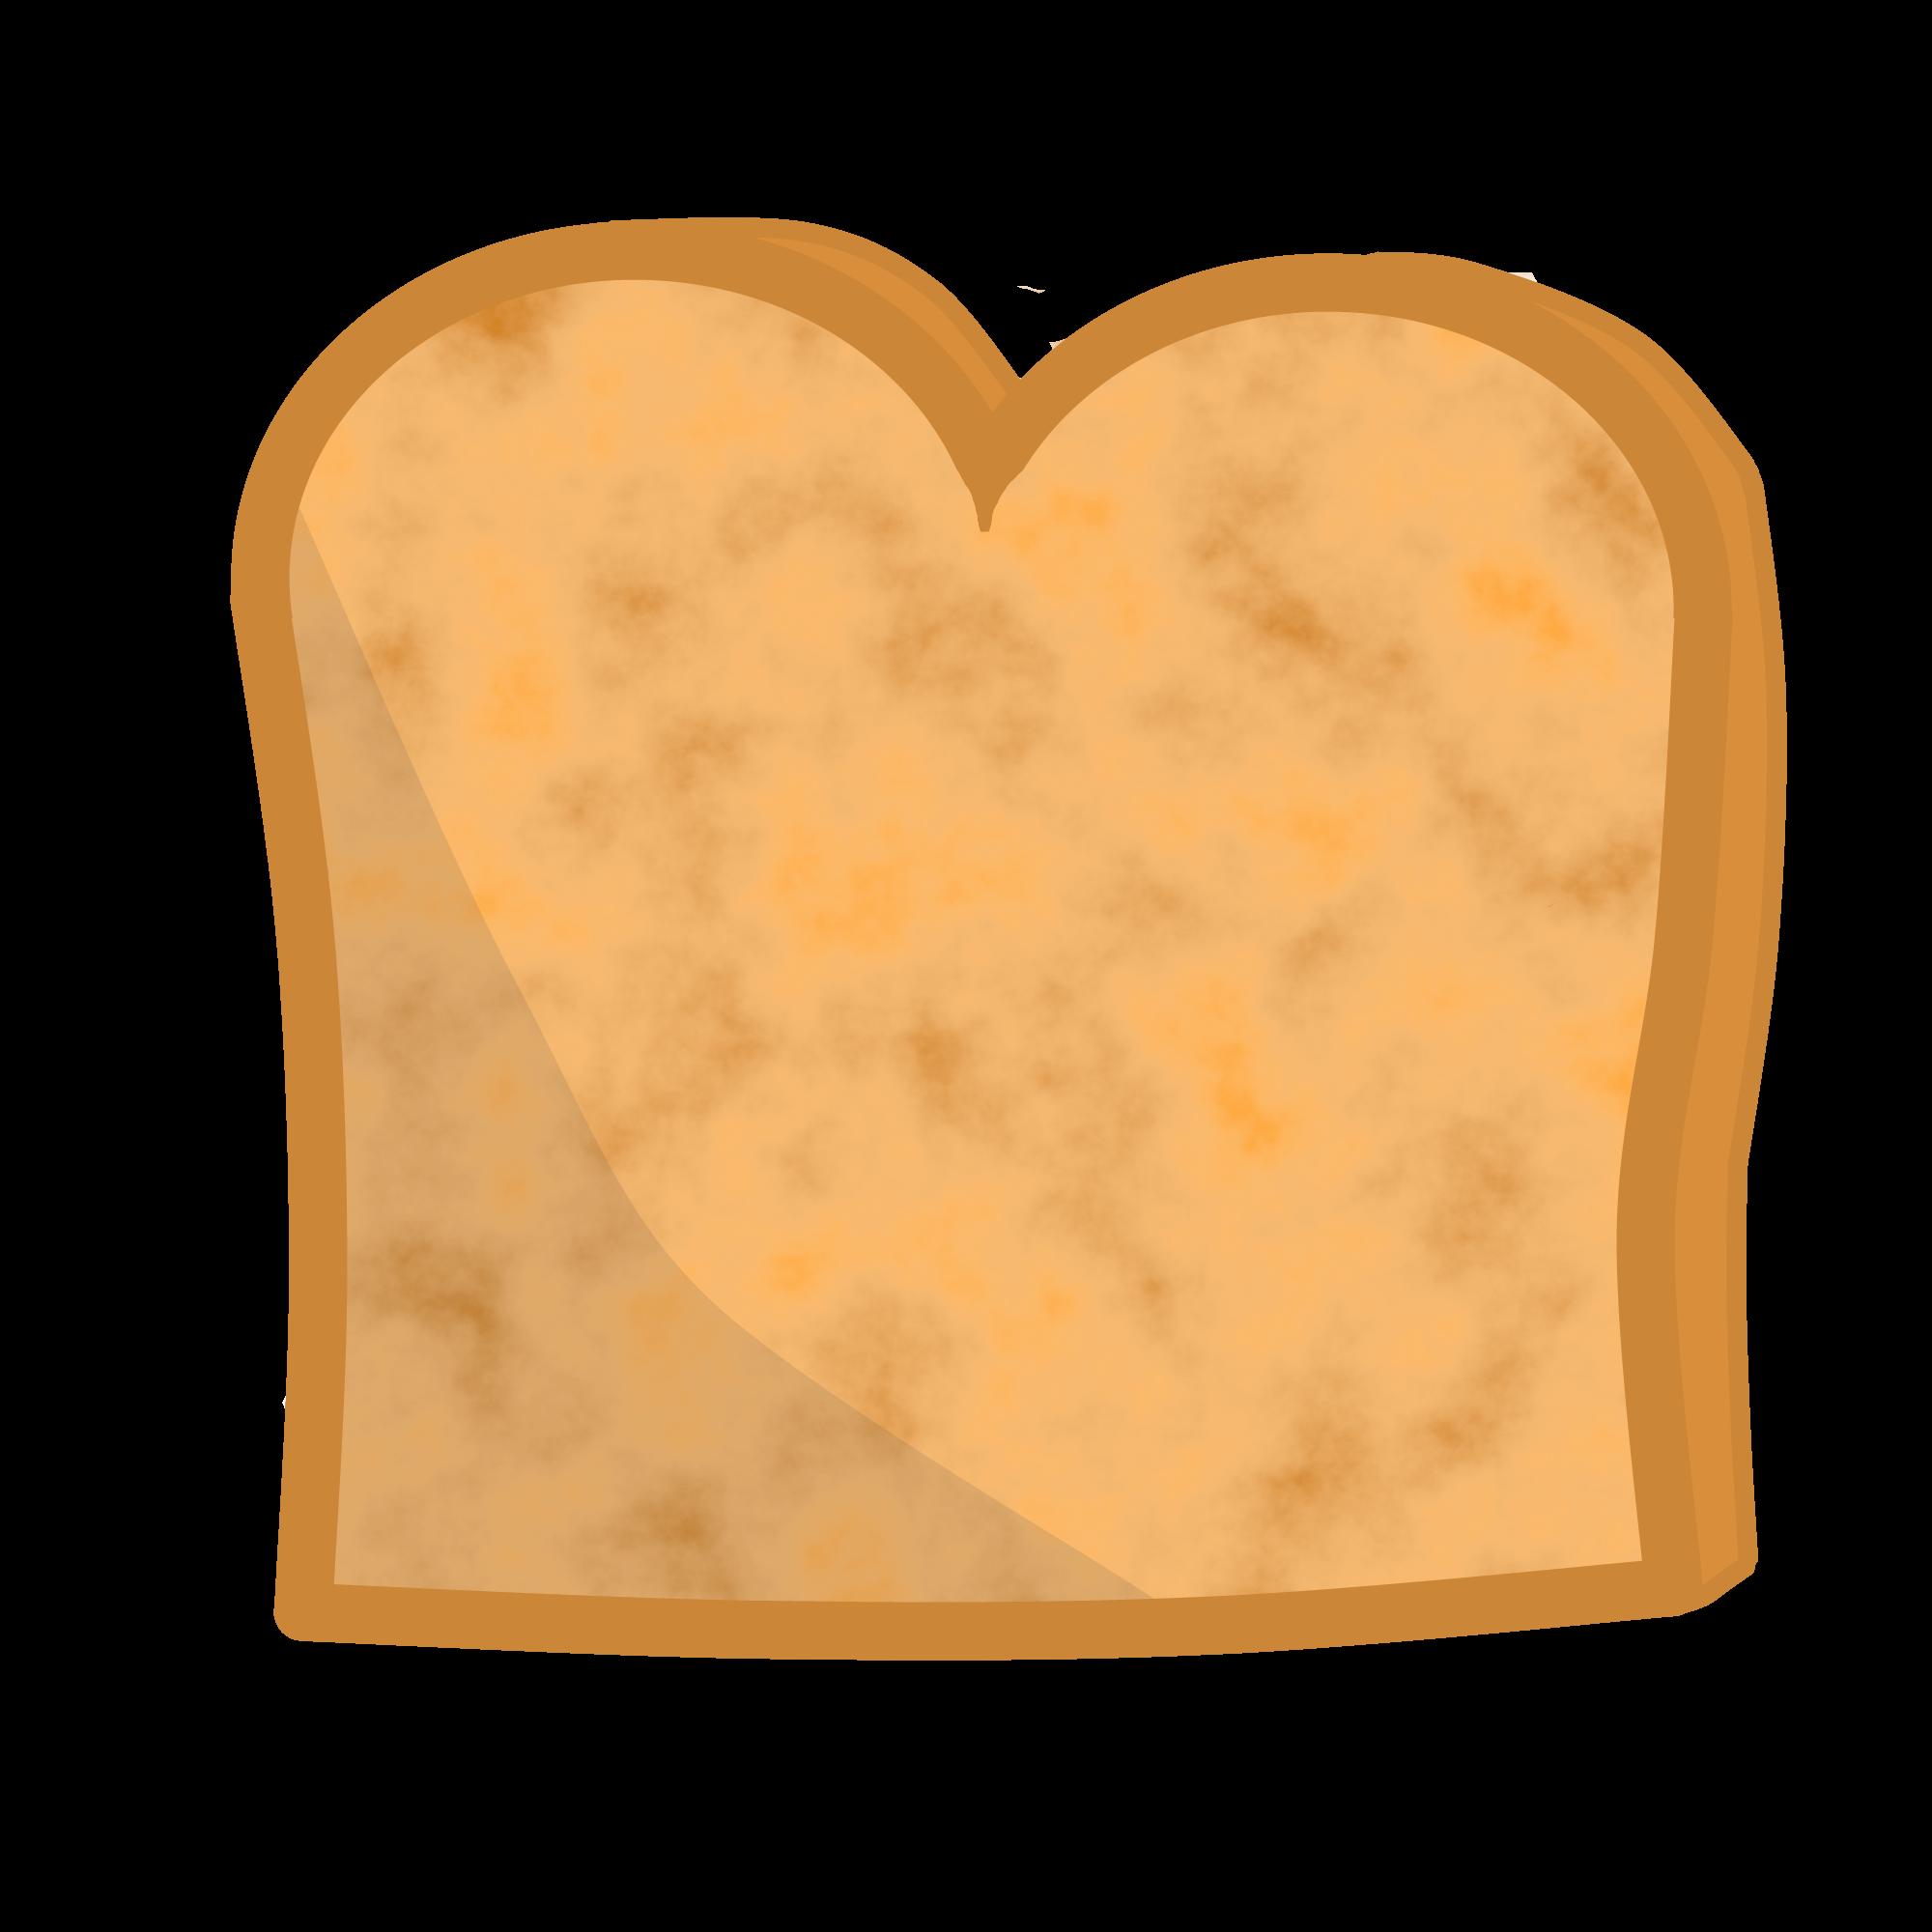 toast object mayhem wiki fandom powered by wikia Breakfast Clip Art french toast clip art free